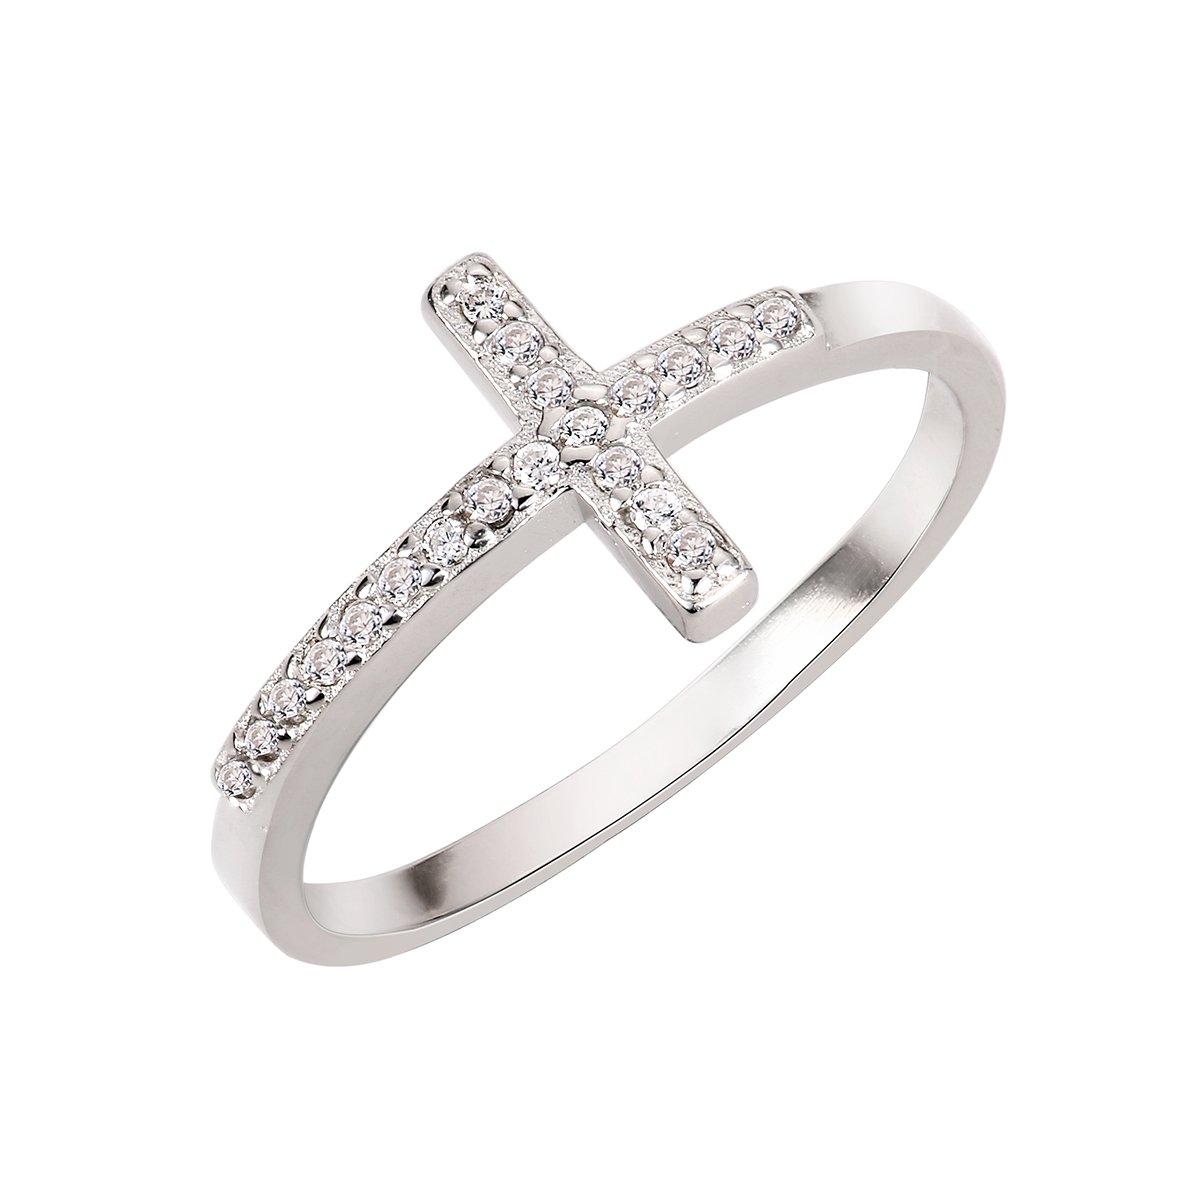 CloseoutWarehouse Cubic Zirconia Saint John Sideway Cross Ring Sterling Silver Size 5